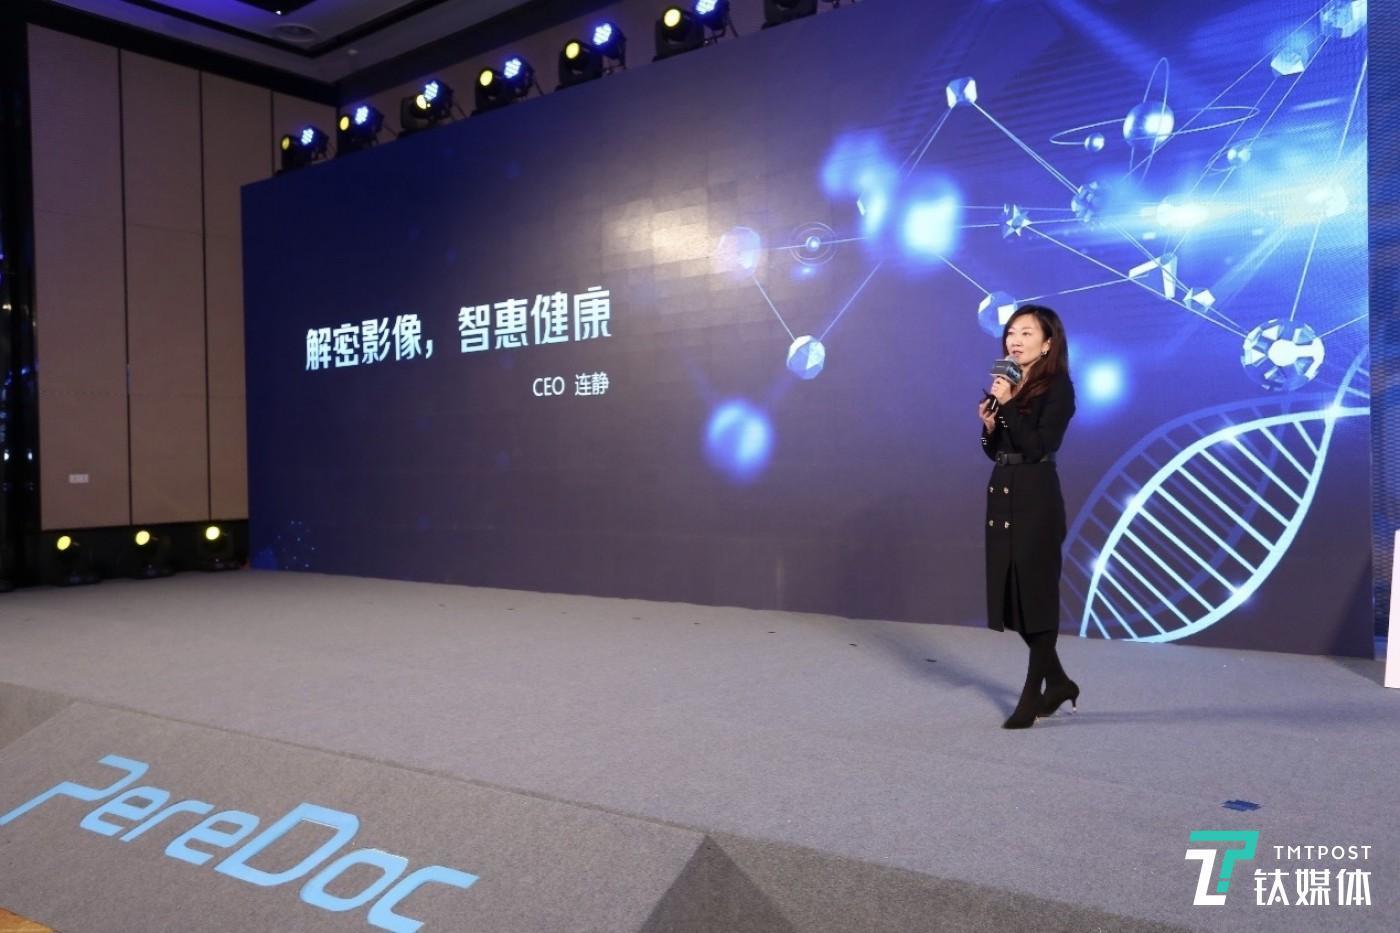 CEO 连静发布PereDoc 五大新产品